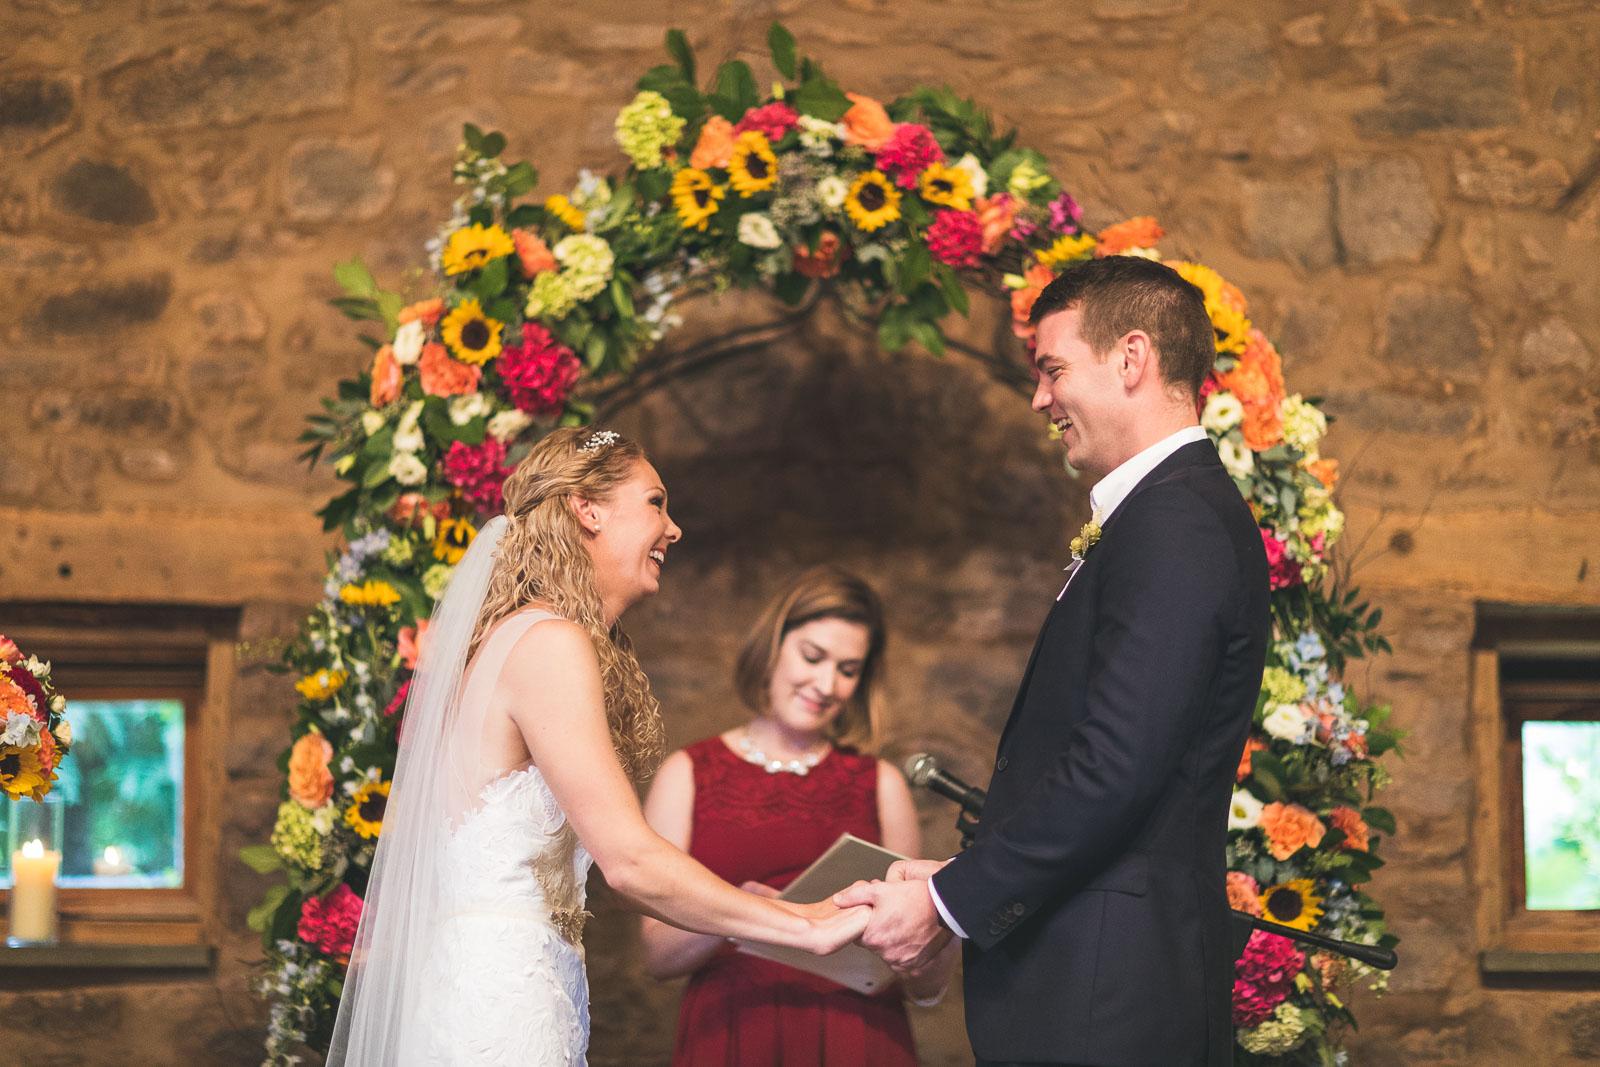 Willowwood Arboretum Wedding Ceremony Laughing